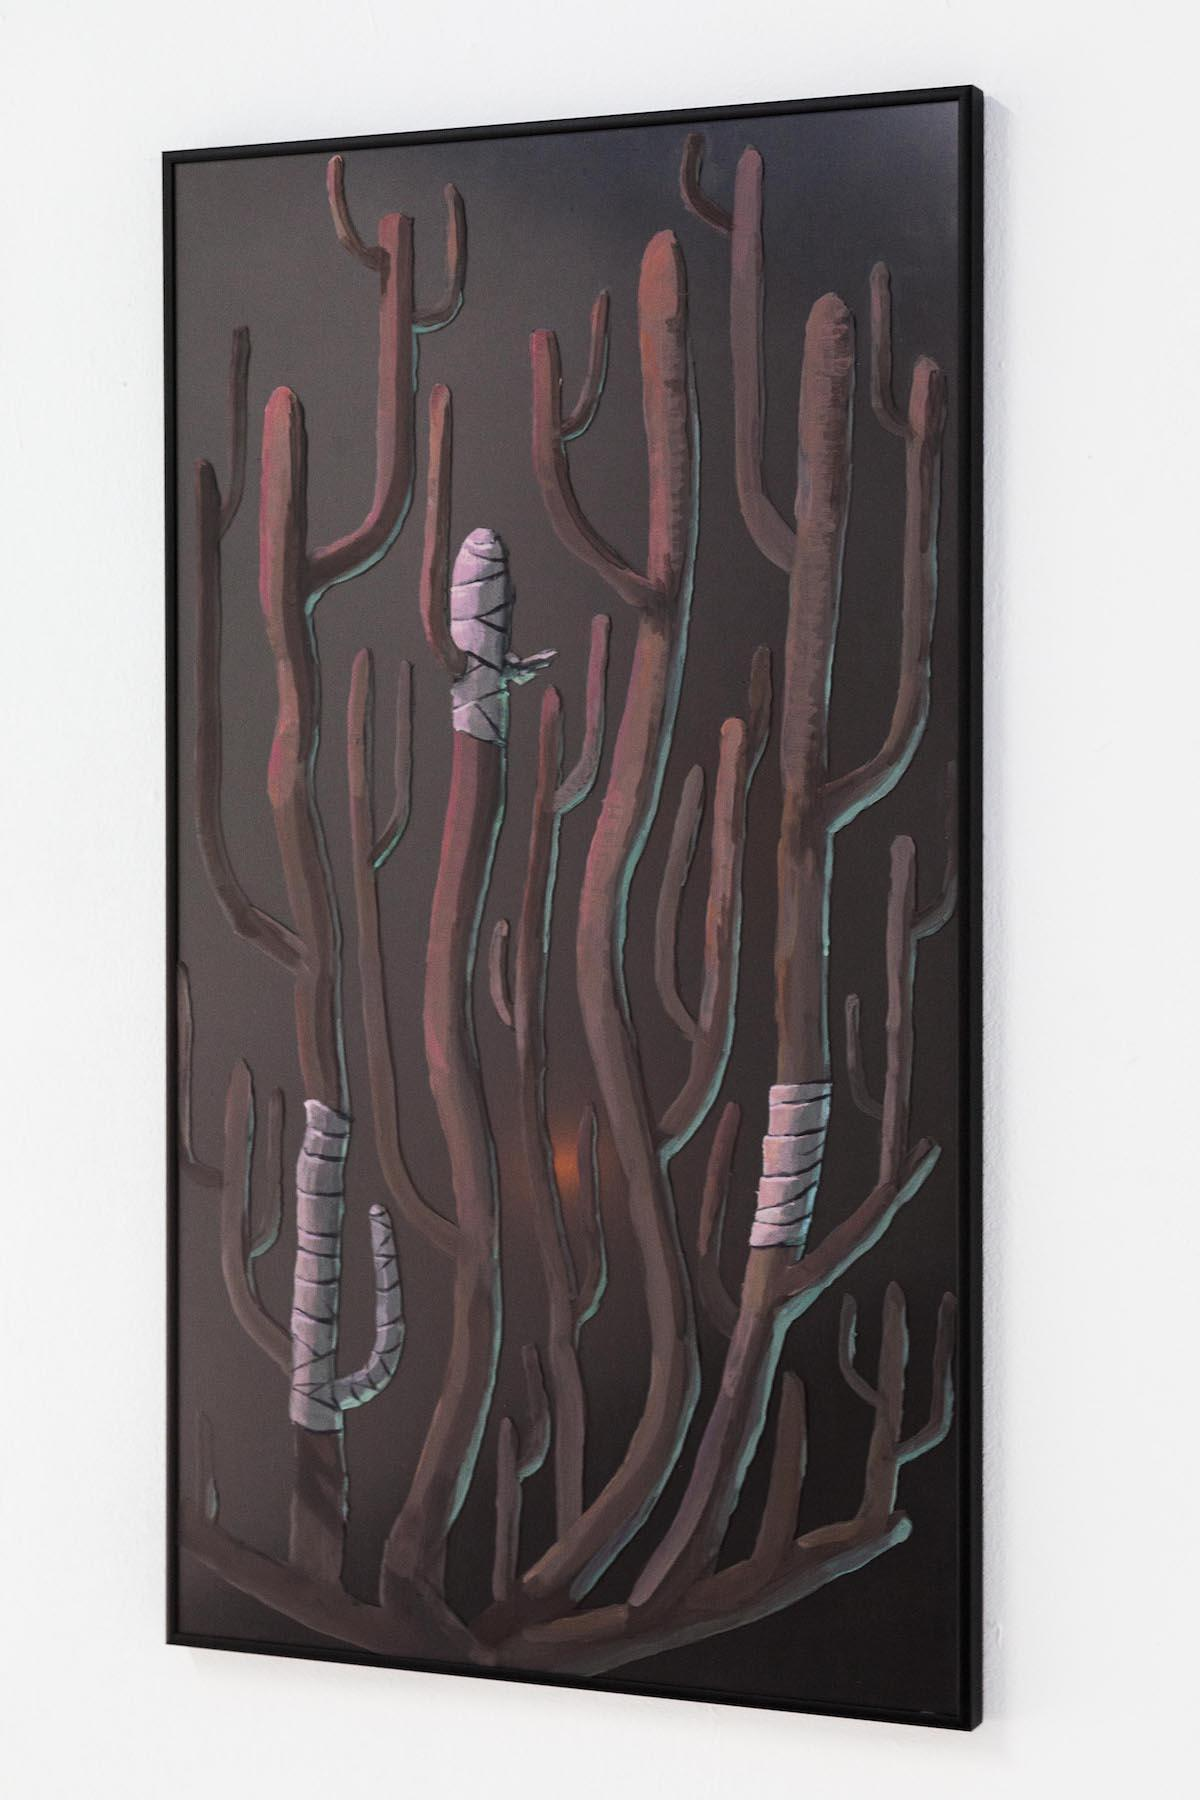 Lukas Posch, Die Nerven (getwellsoon), 2017,Acrylicon glass, aluminium, wood, 82 x 46 cm